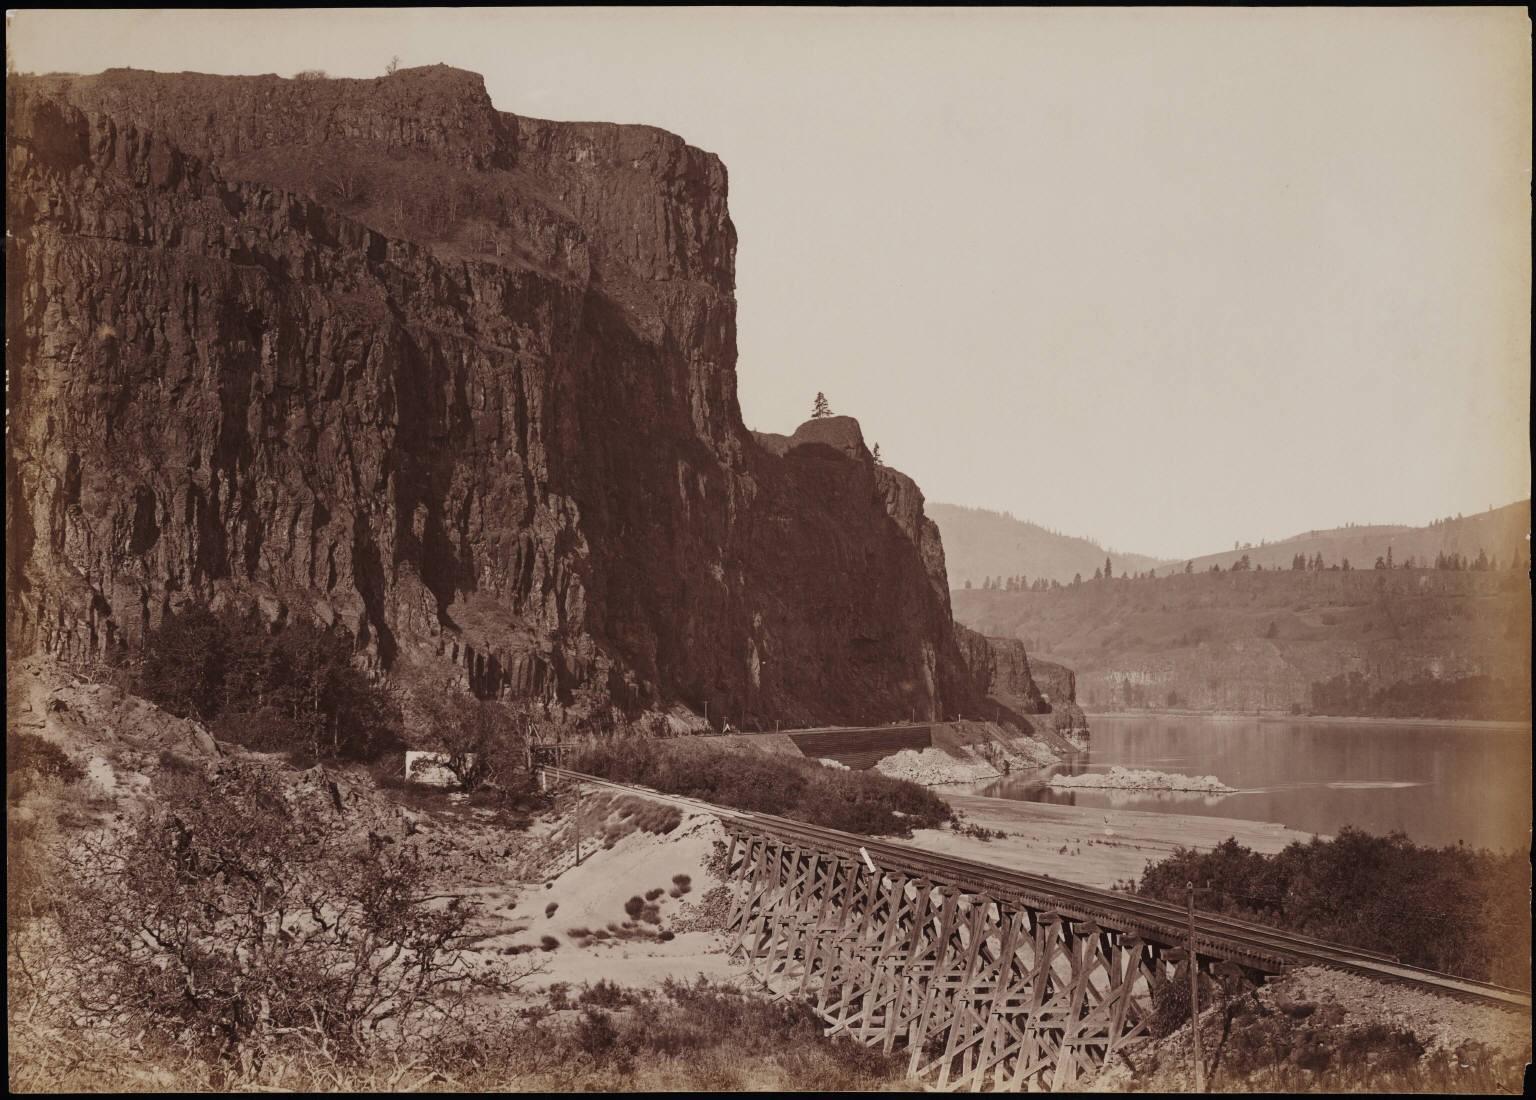 An American railway circa 1884-1885